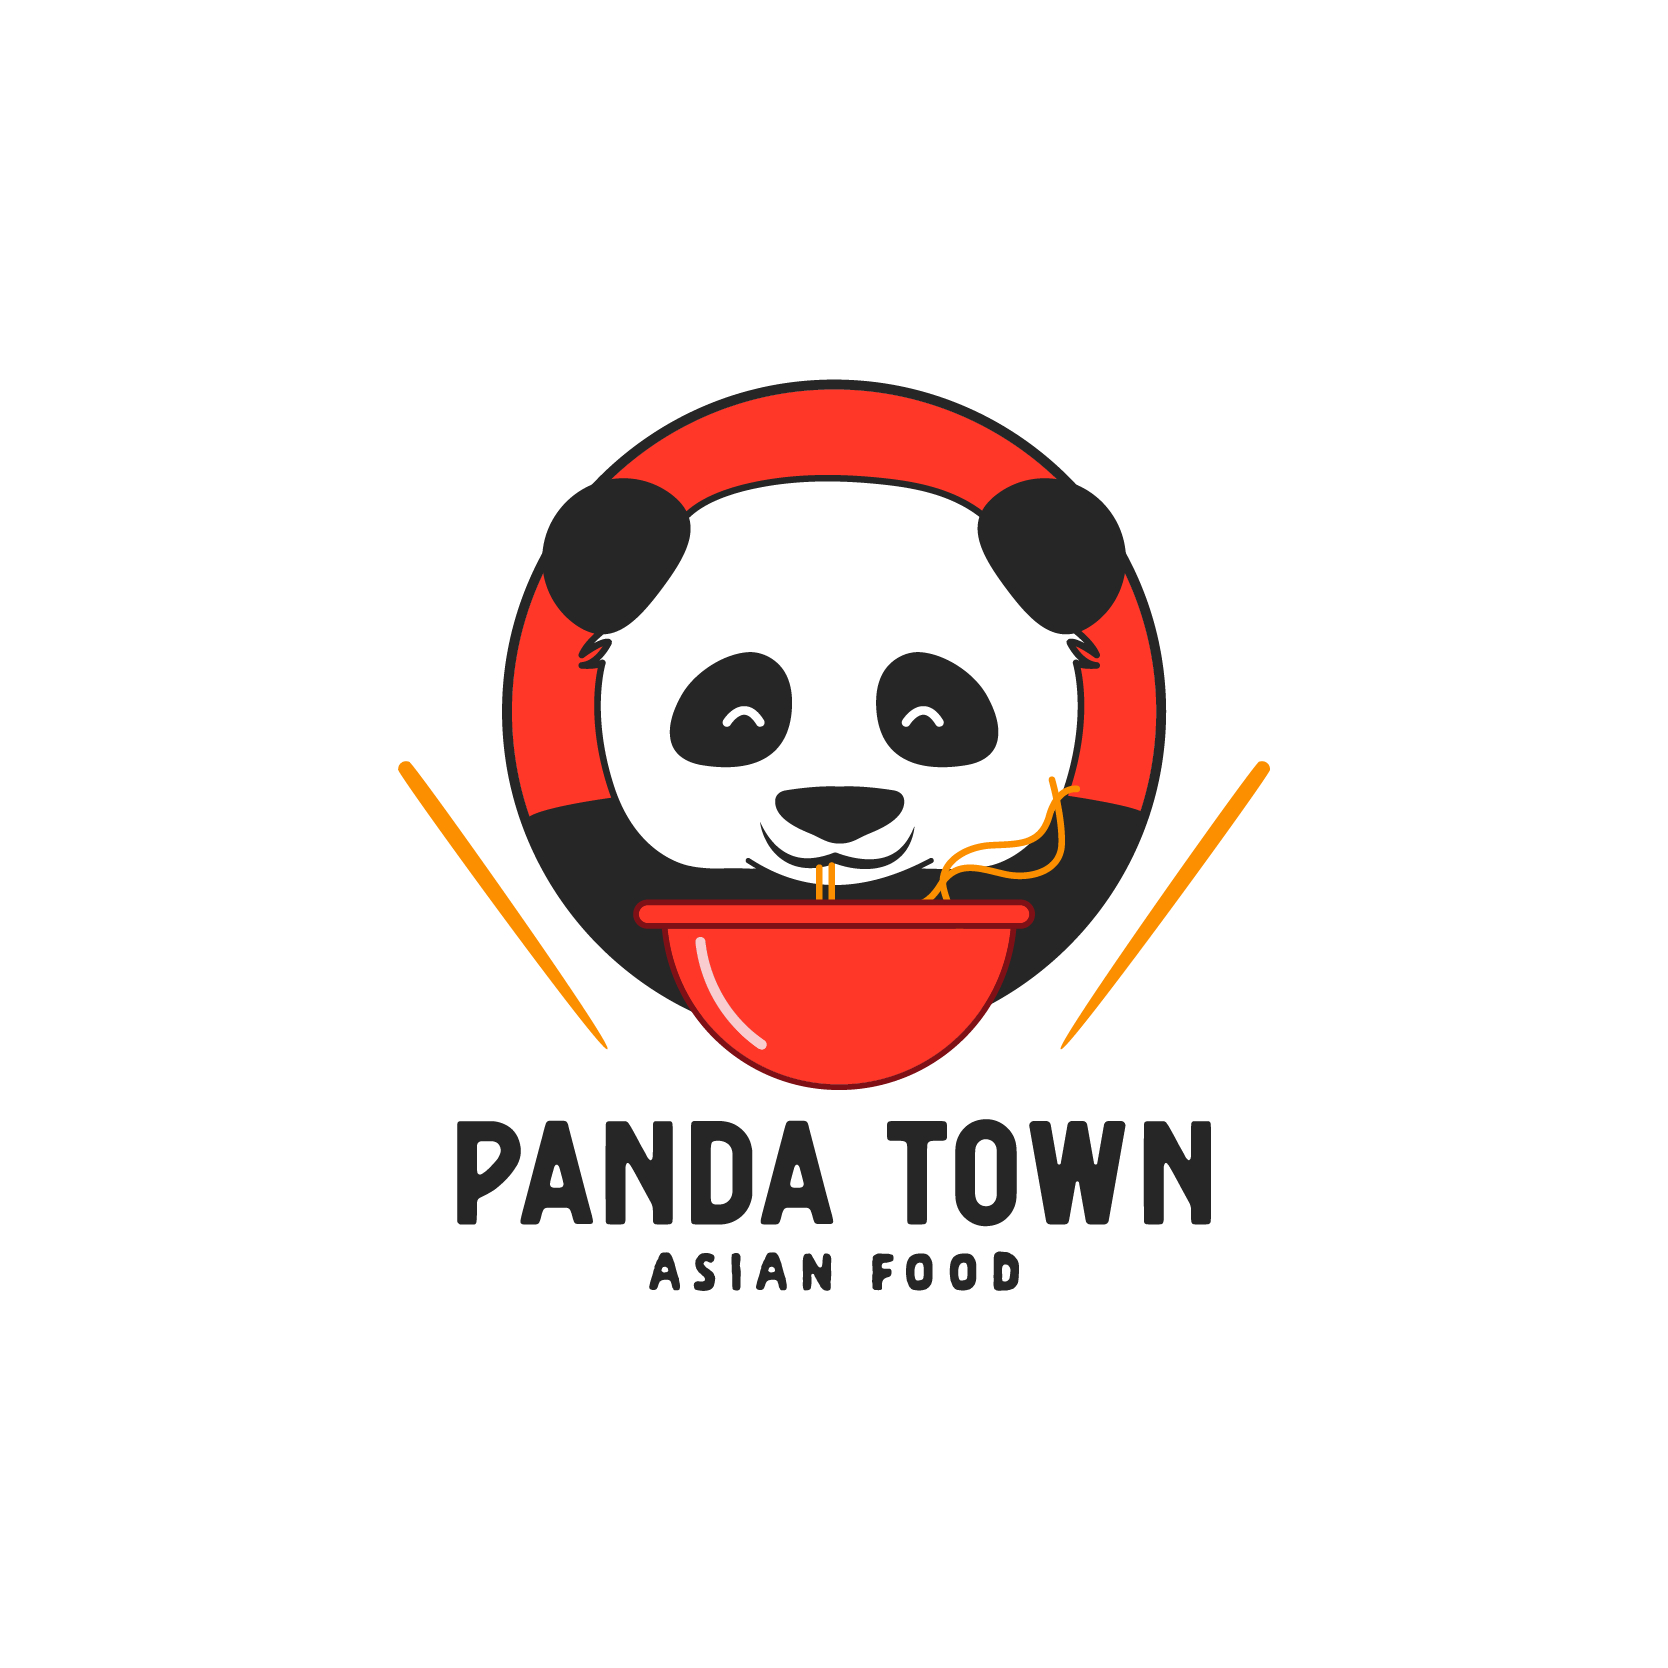 Panda Town